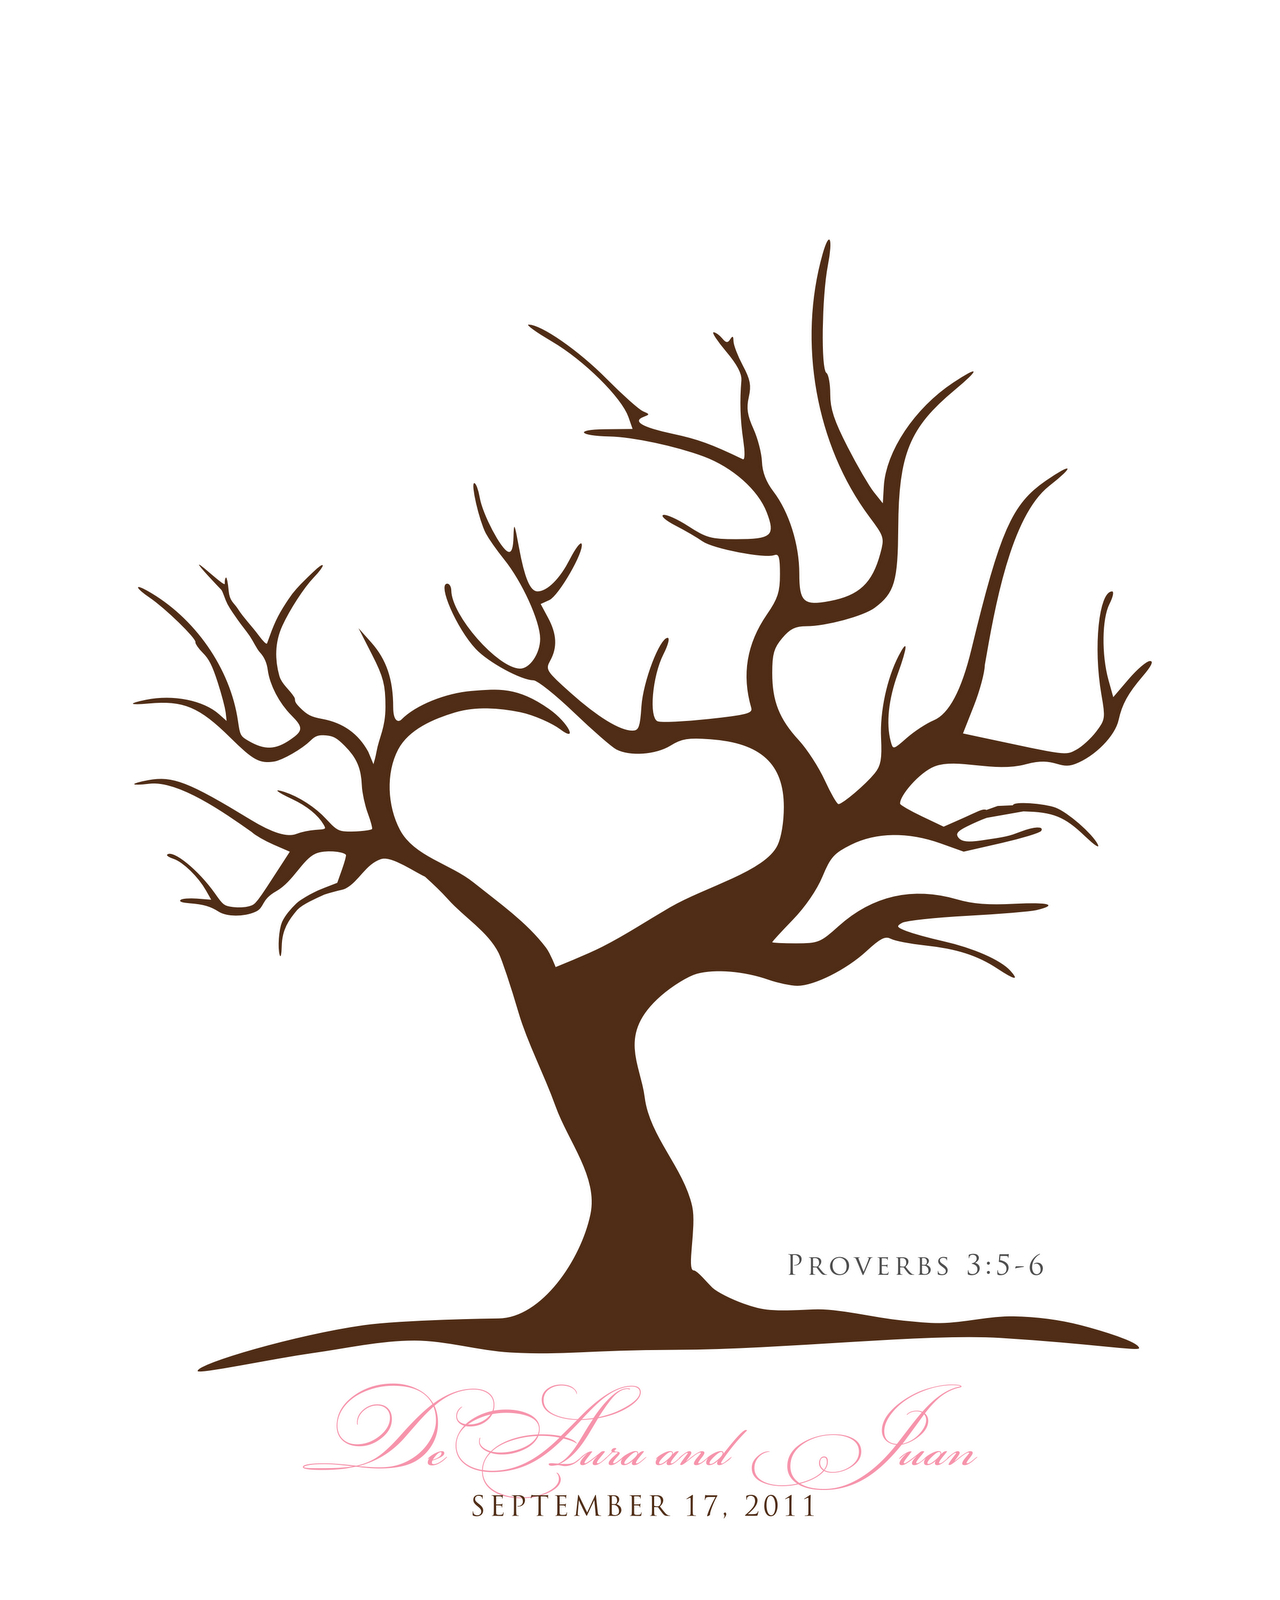 Free Printable Fingerprint Tree Template   Embroidery   Fingerprint - Free Printable Tree Template